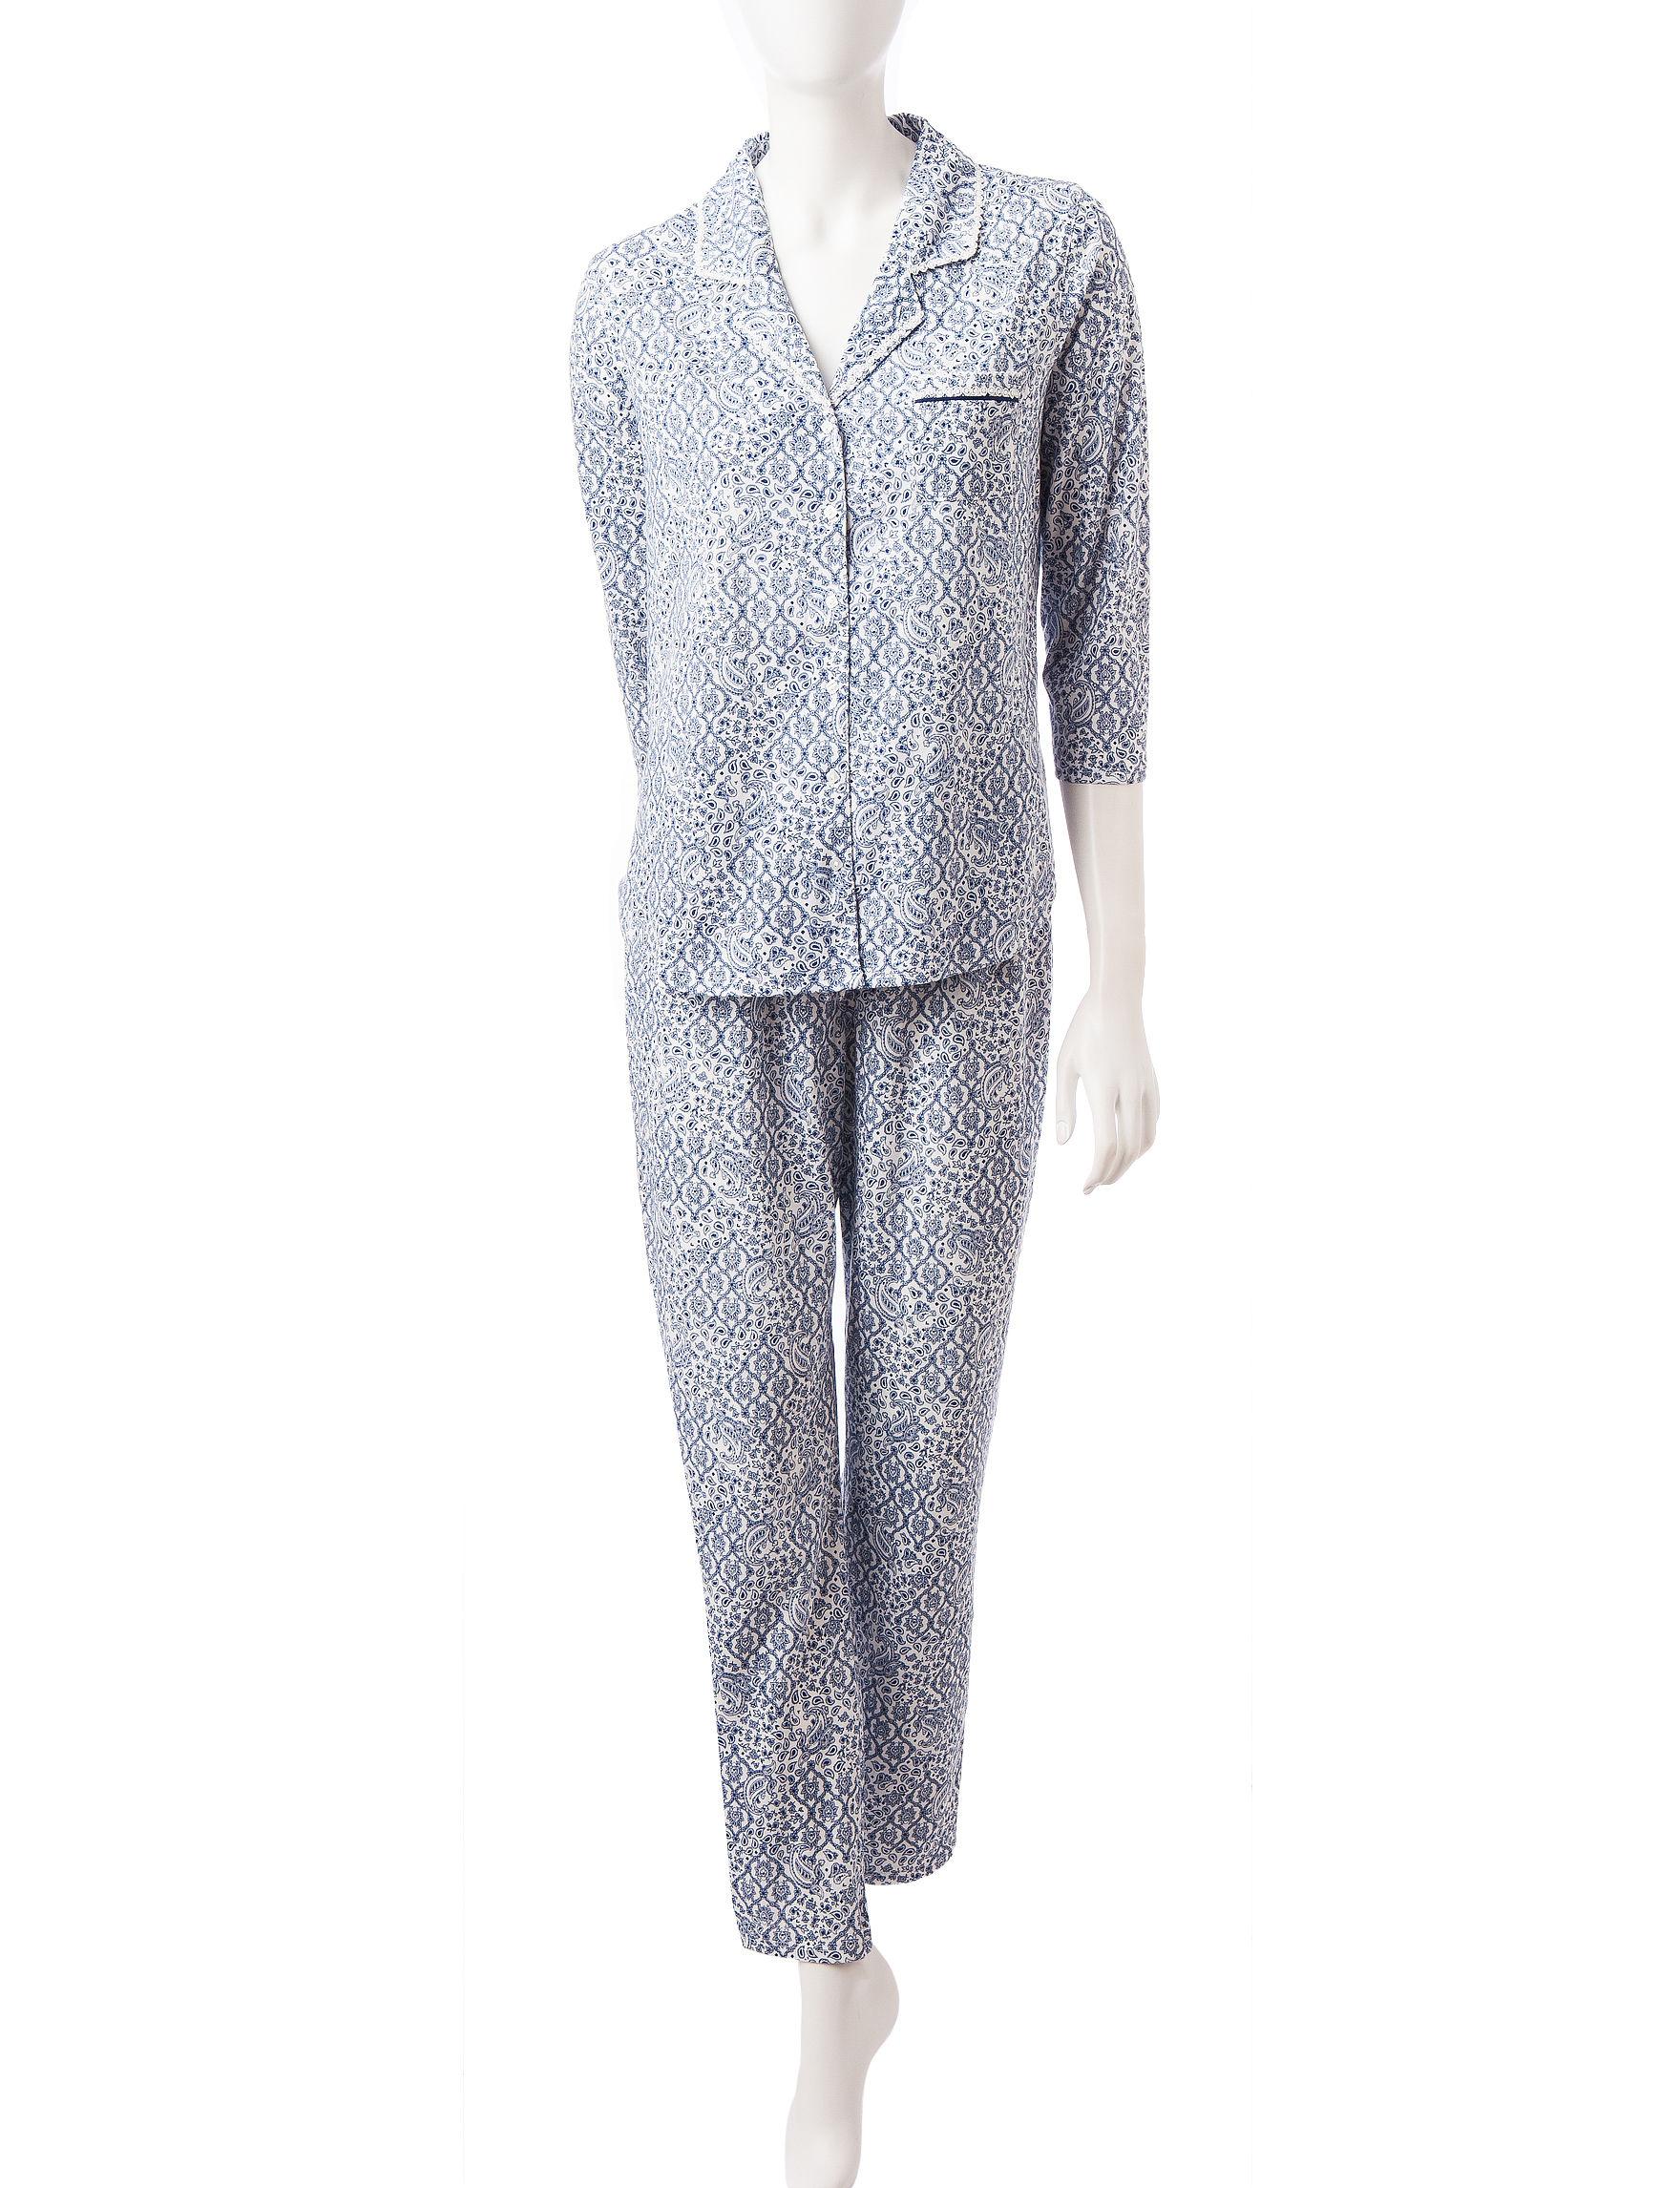 Aria White / Navy Pajama Sets